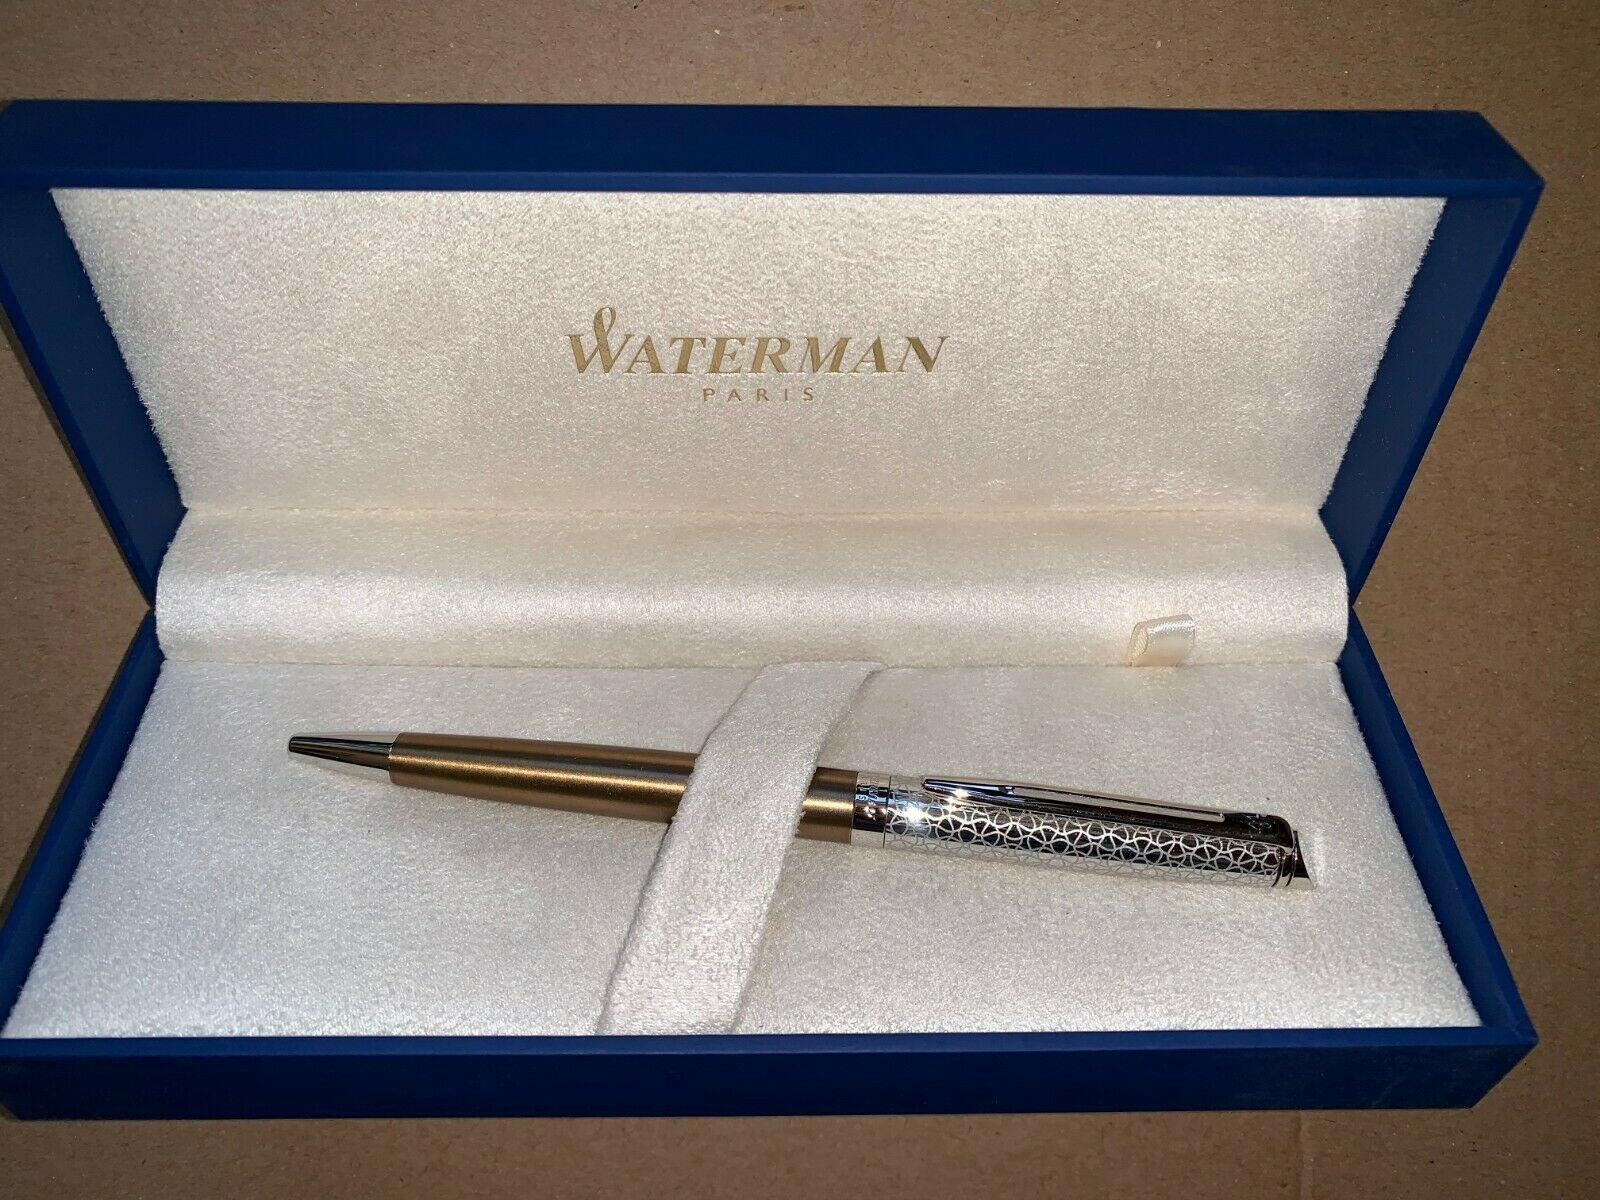 Waterman Hemisphere La Collection Privee Ballpoint Pen Bronze Satine with Chrome